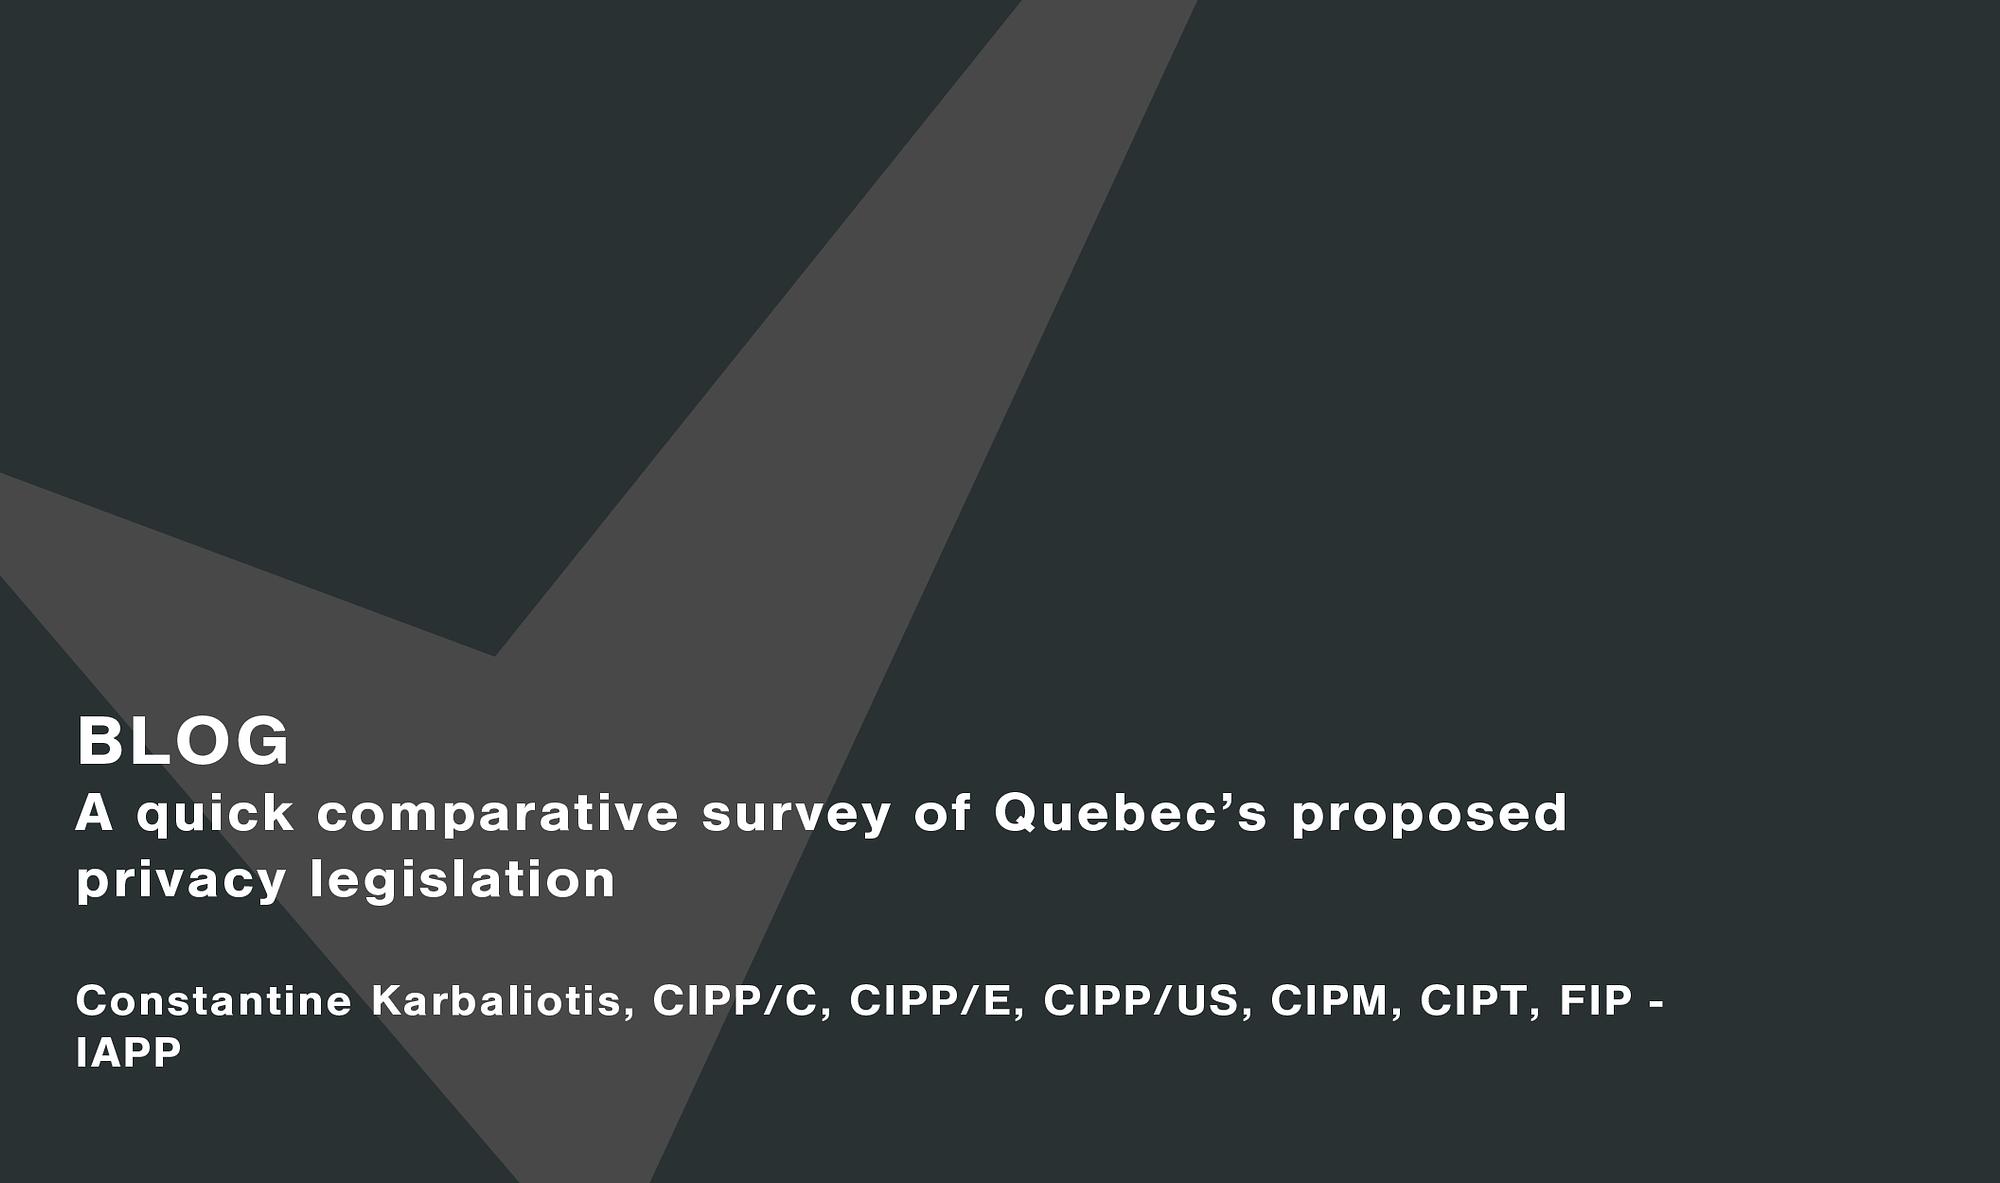 A-quick-comparative-survey-of-Quebecs-proposed-privacy-legislation